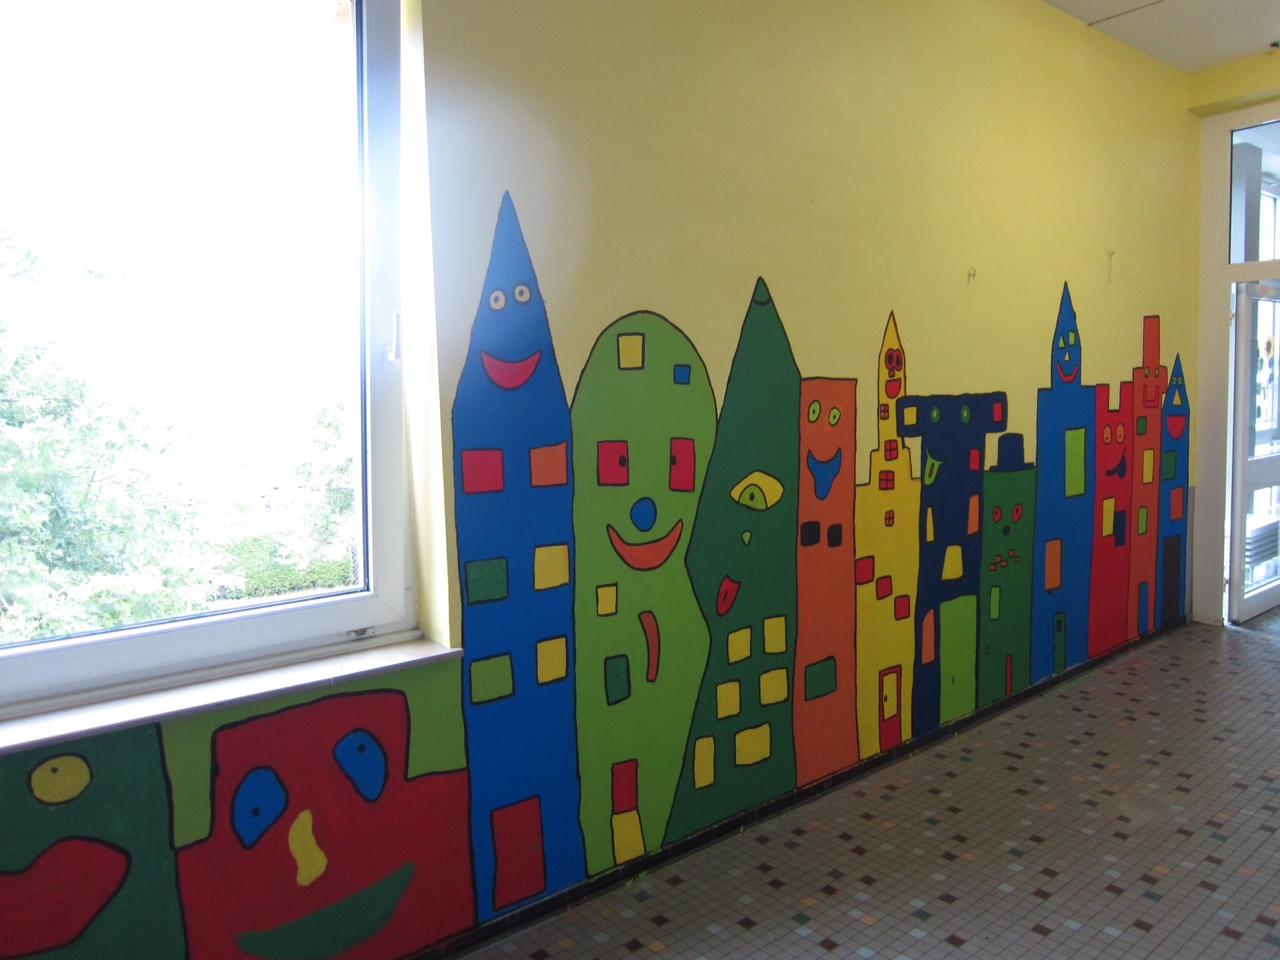 Wandgestaltung christophorus schule in betzdorf bruche for Schule design